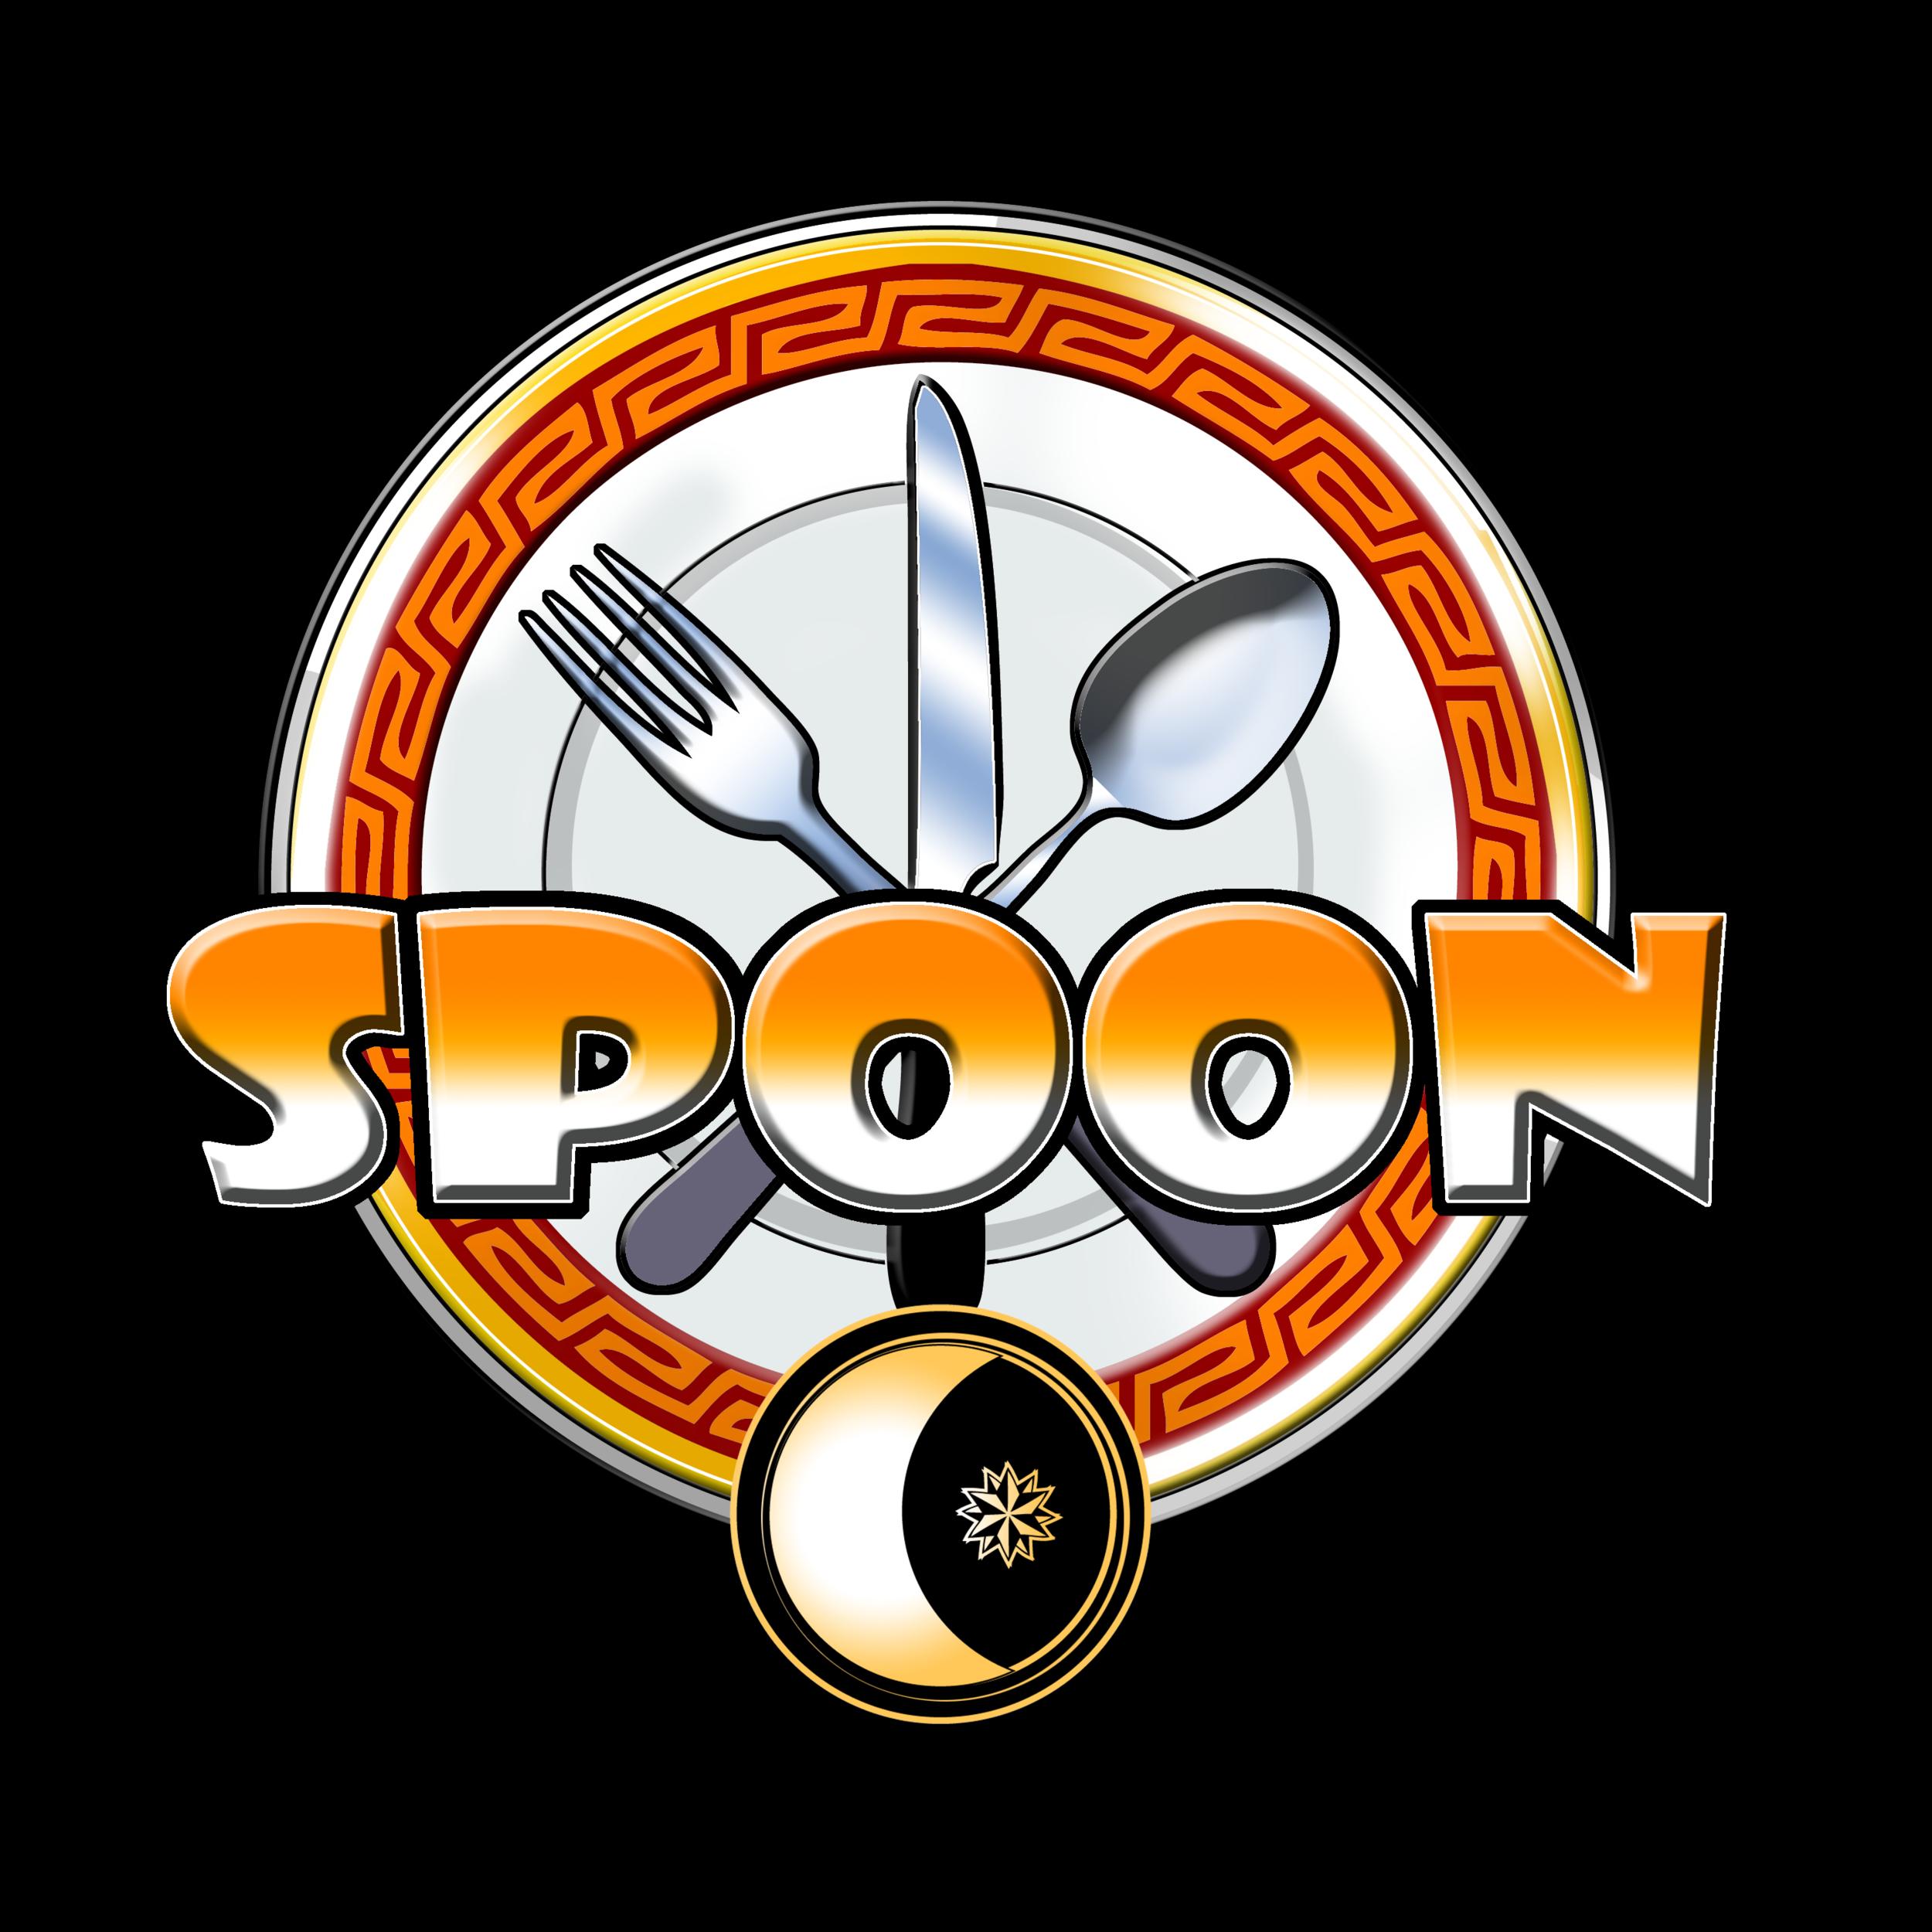 SPOON-LOGO.png